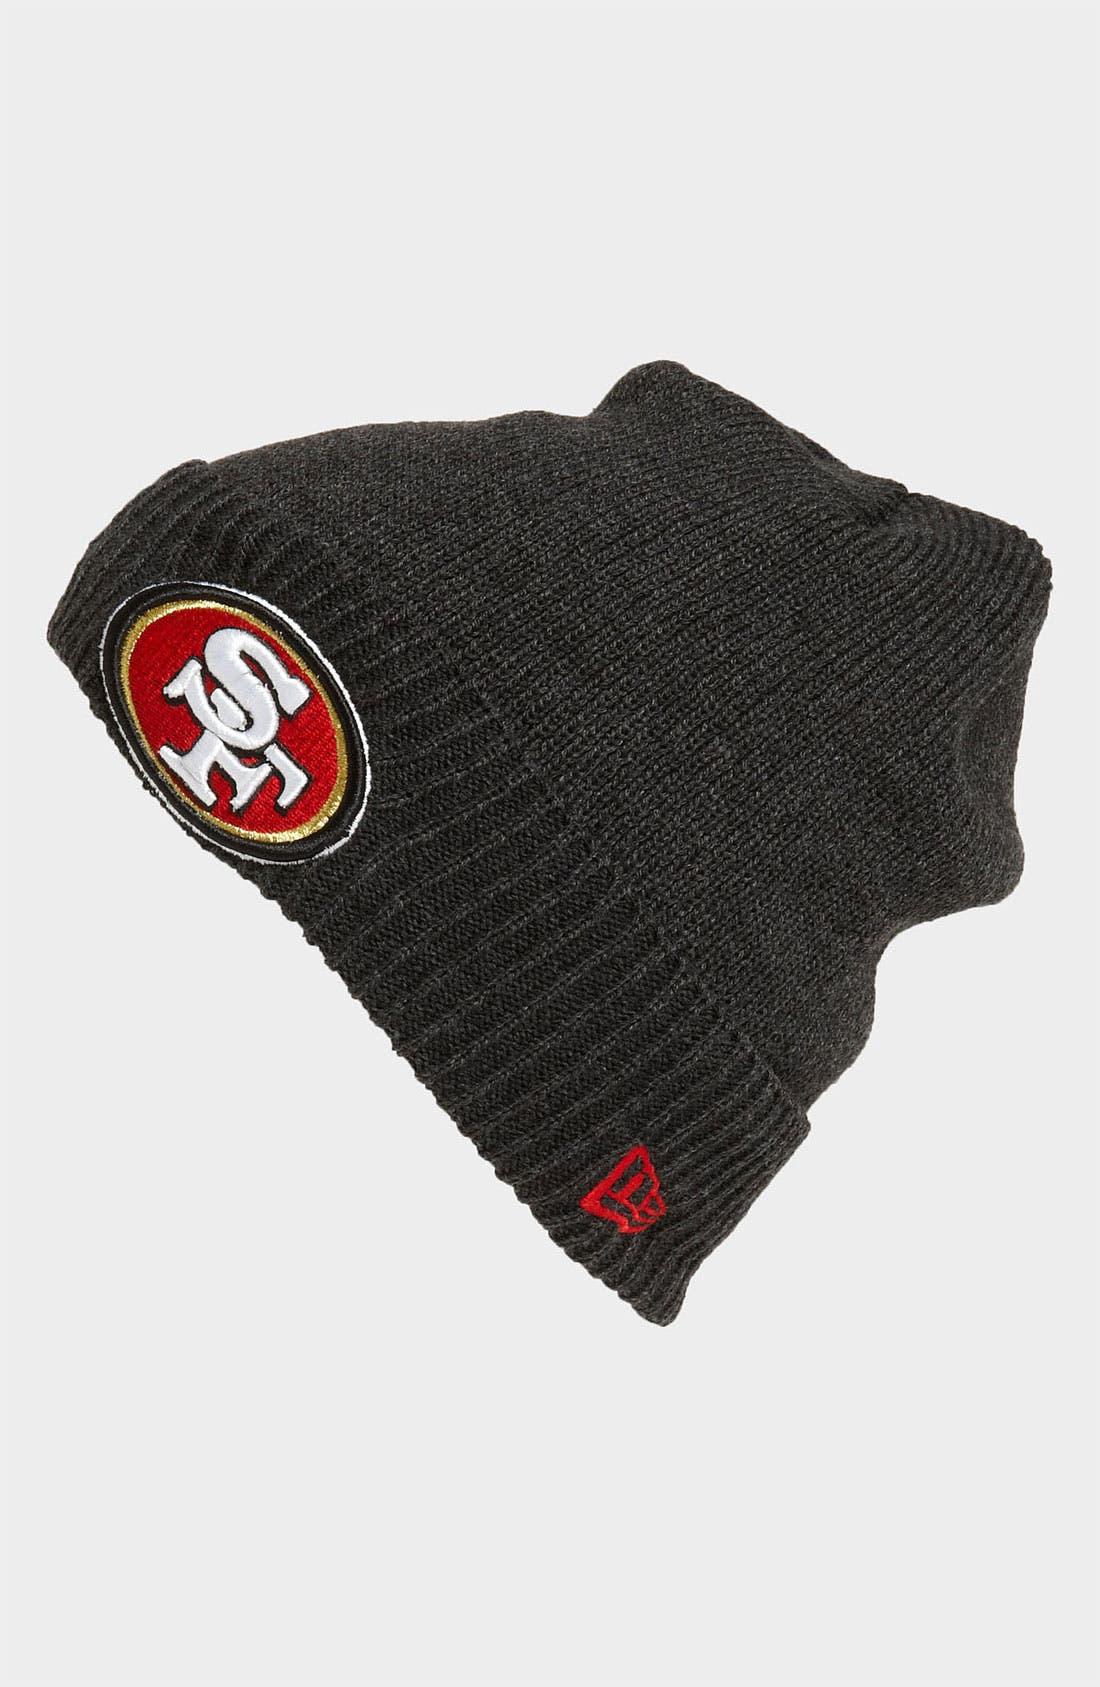 Main Image - New Era Cap 'San Francisco 49ers' Thermal Beanie